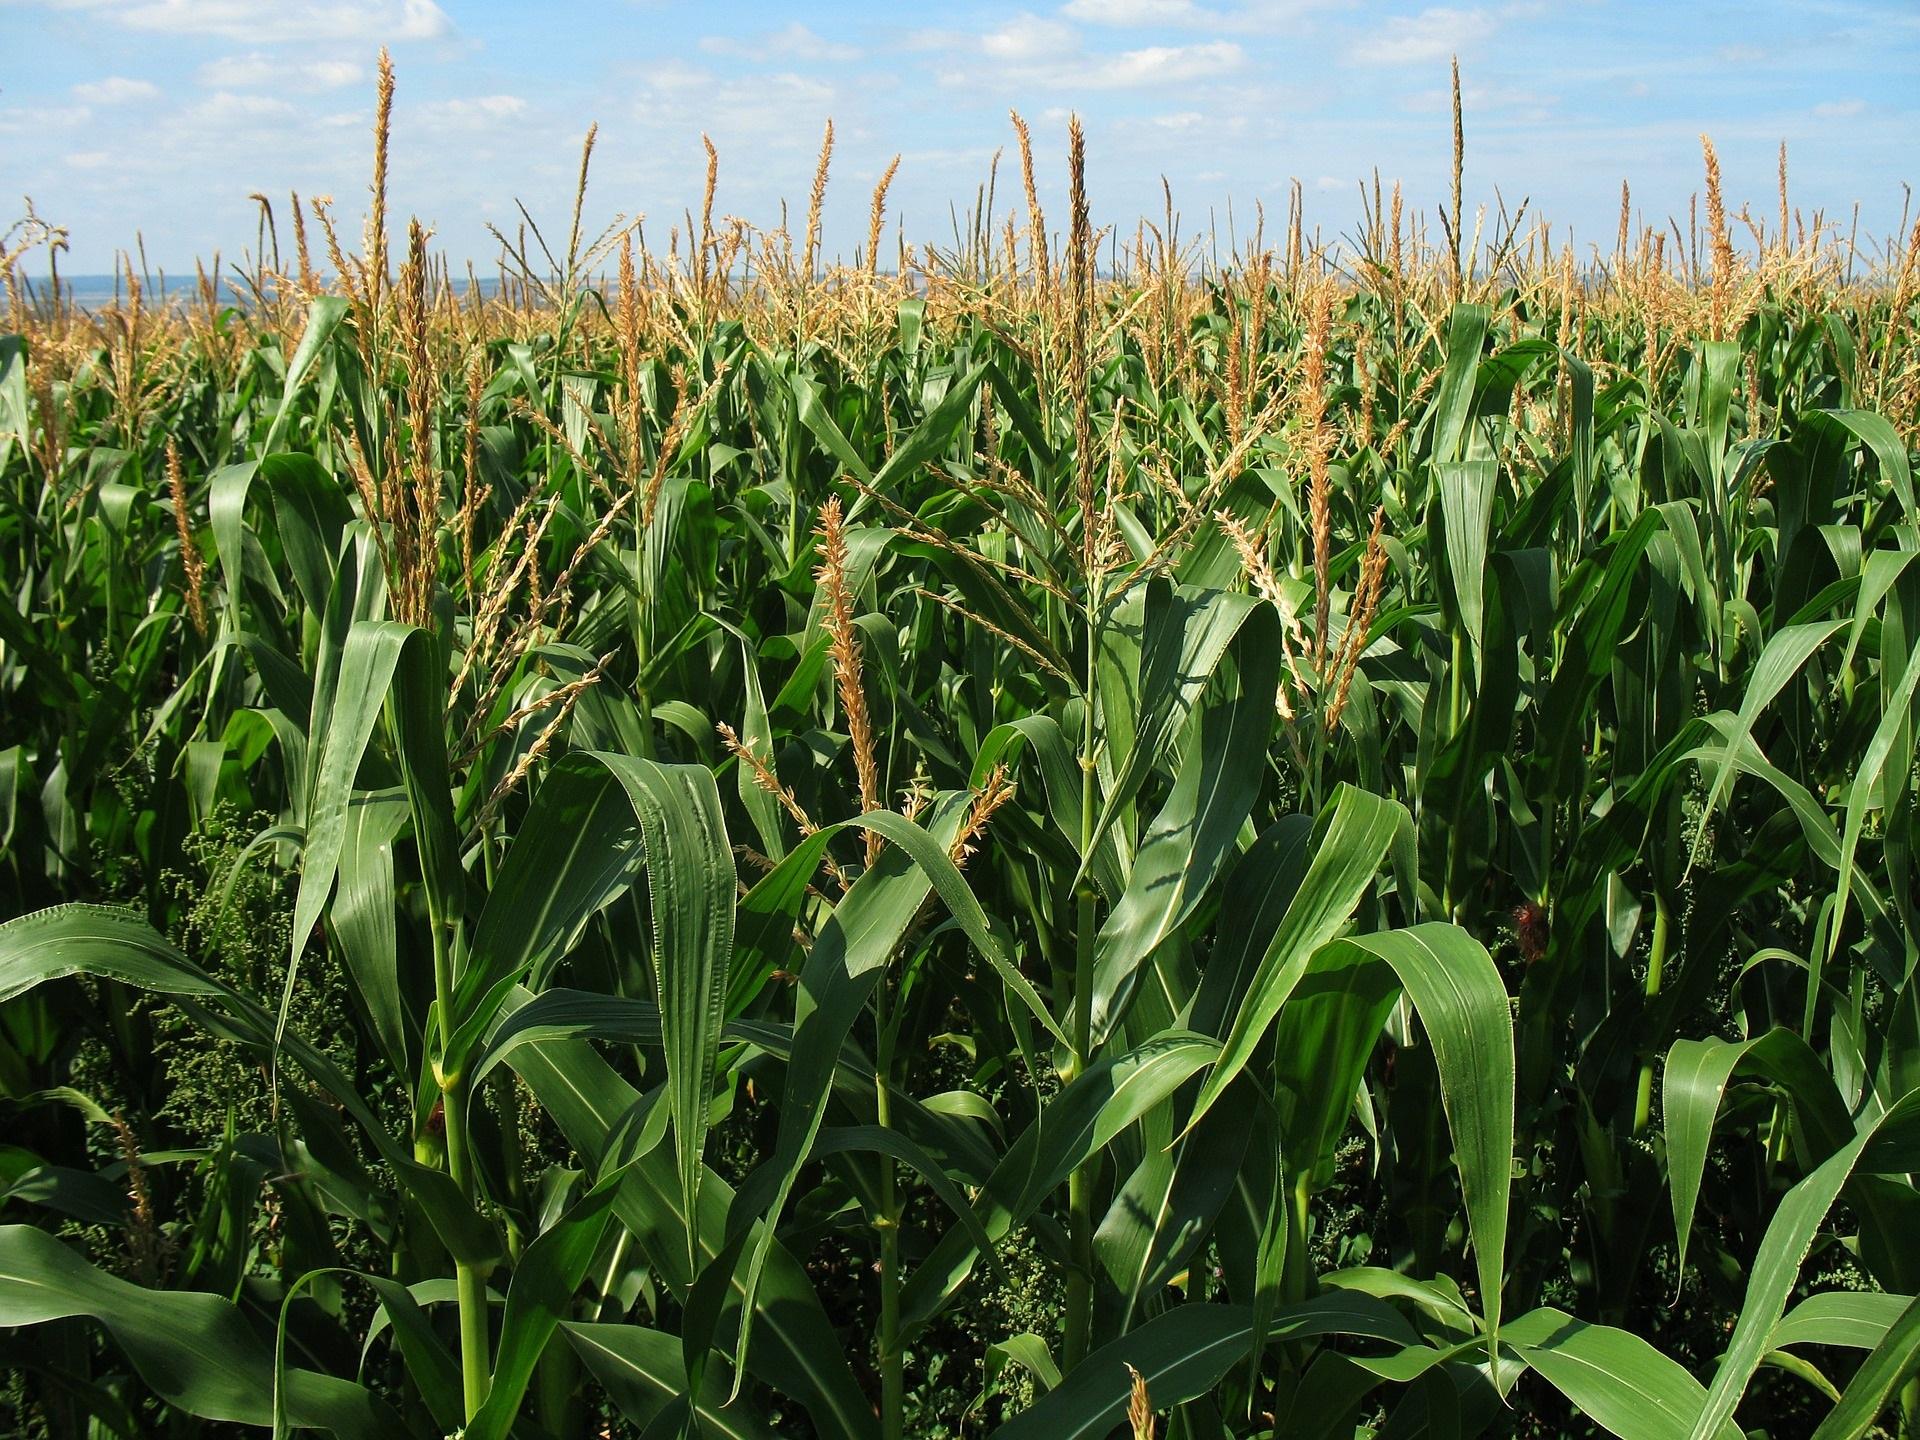 corn-field-1935_1920